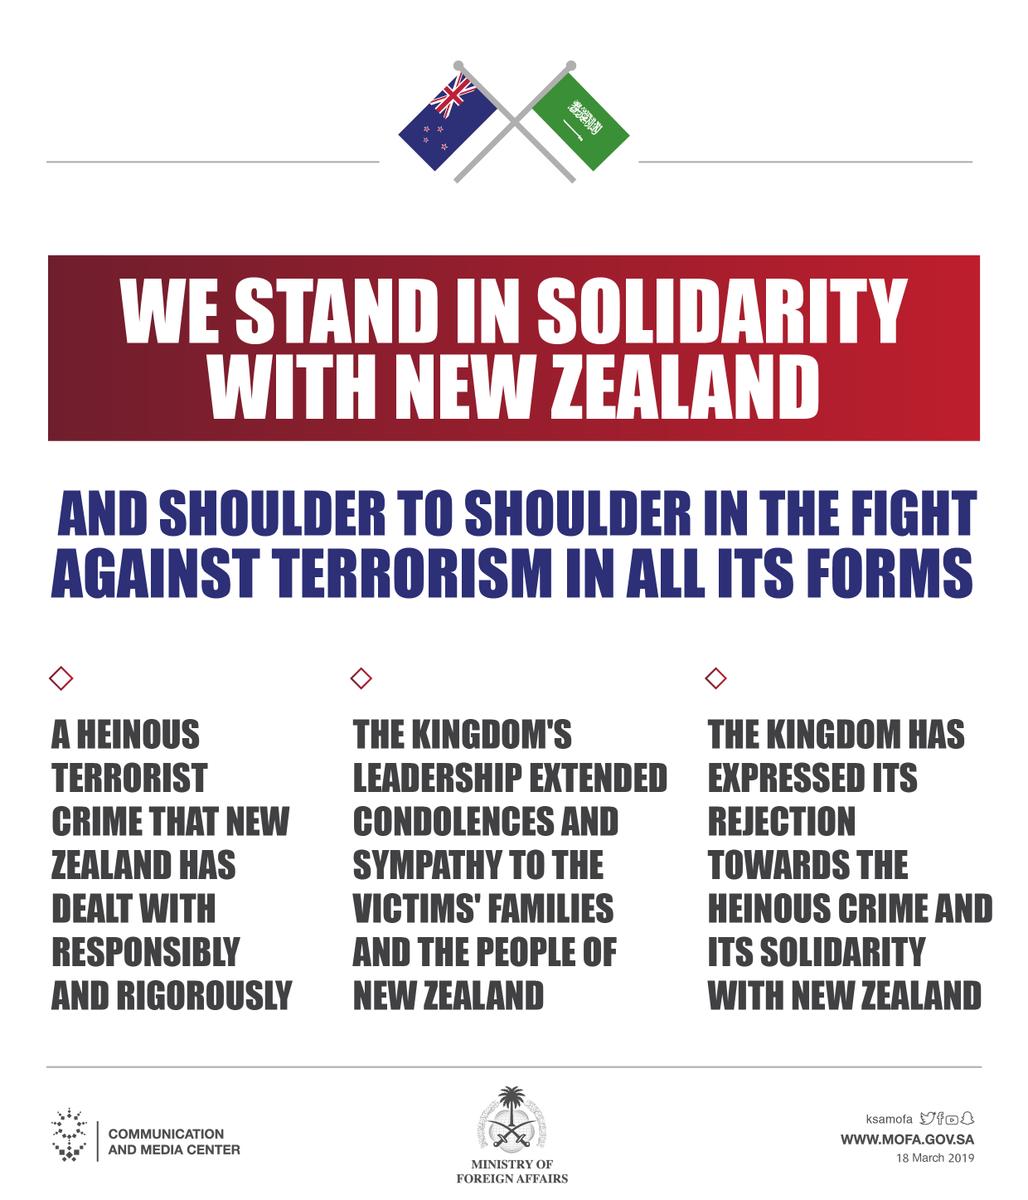 #KSA stands in solidarity with #NewZealand <br>http://pic.twitter.com/jpKwdcxQwx